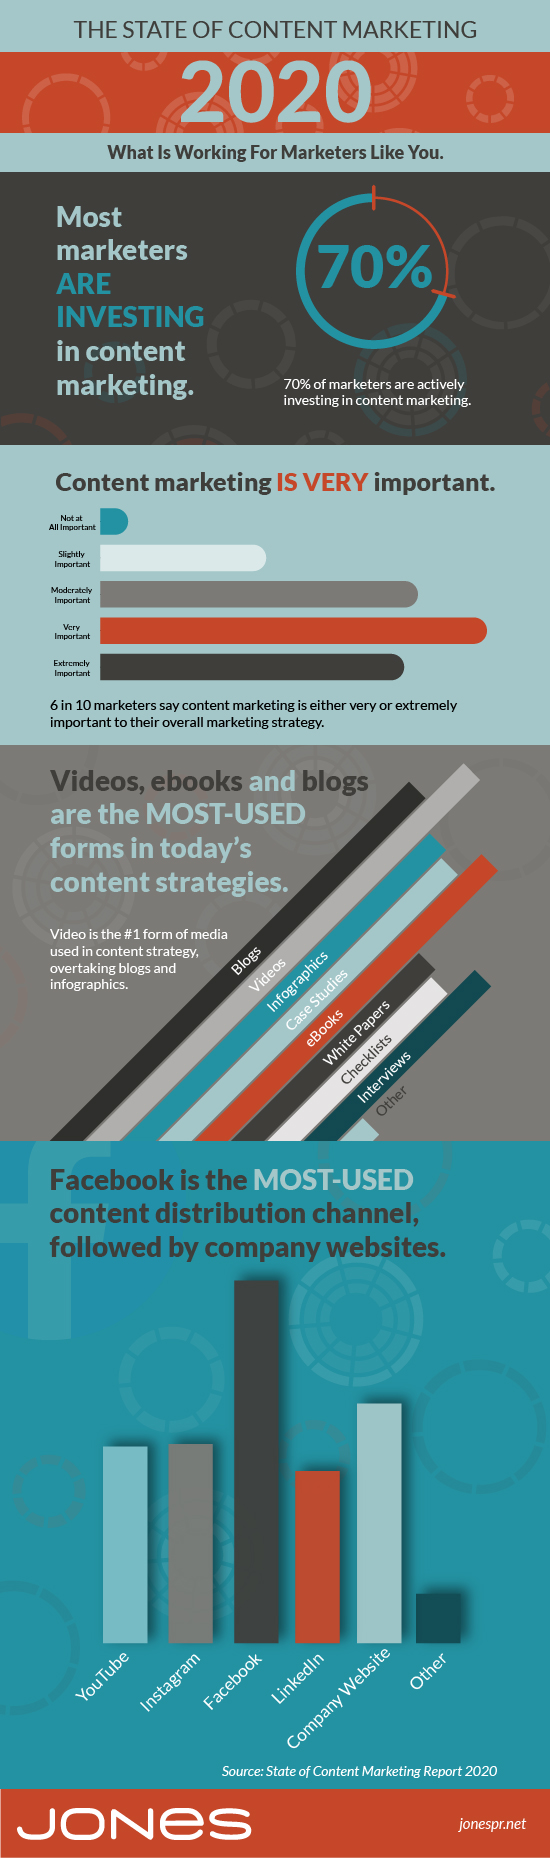 jones infographic content marketing statistics 2020